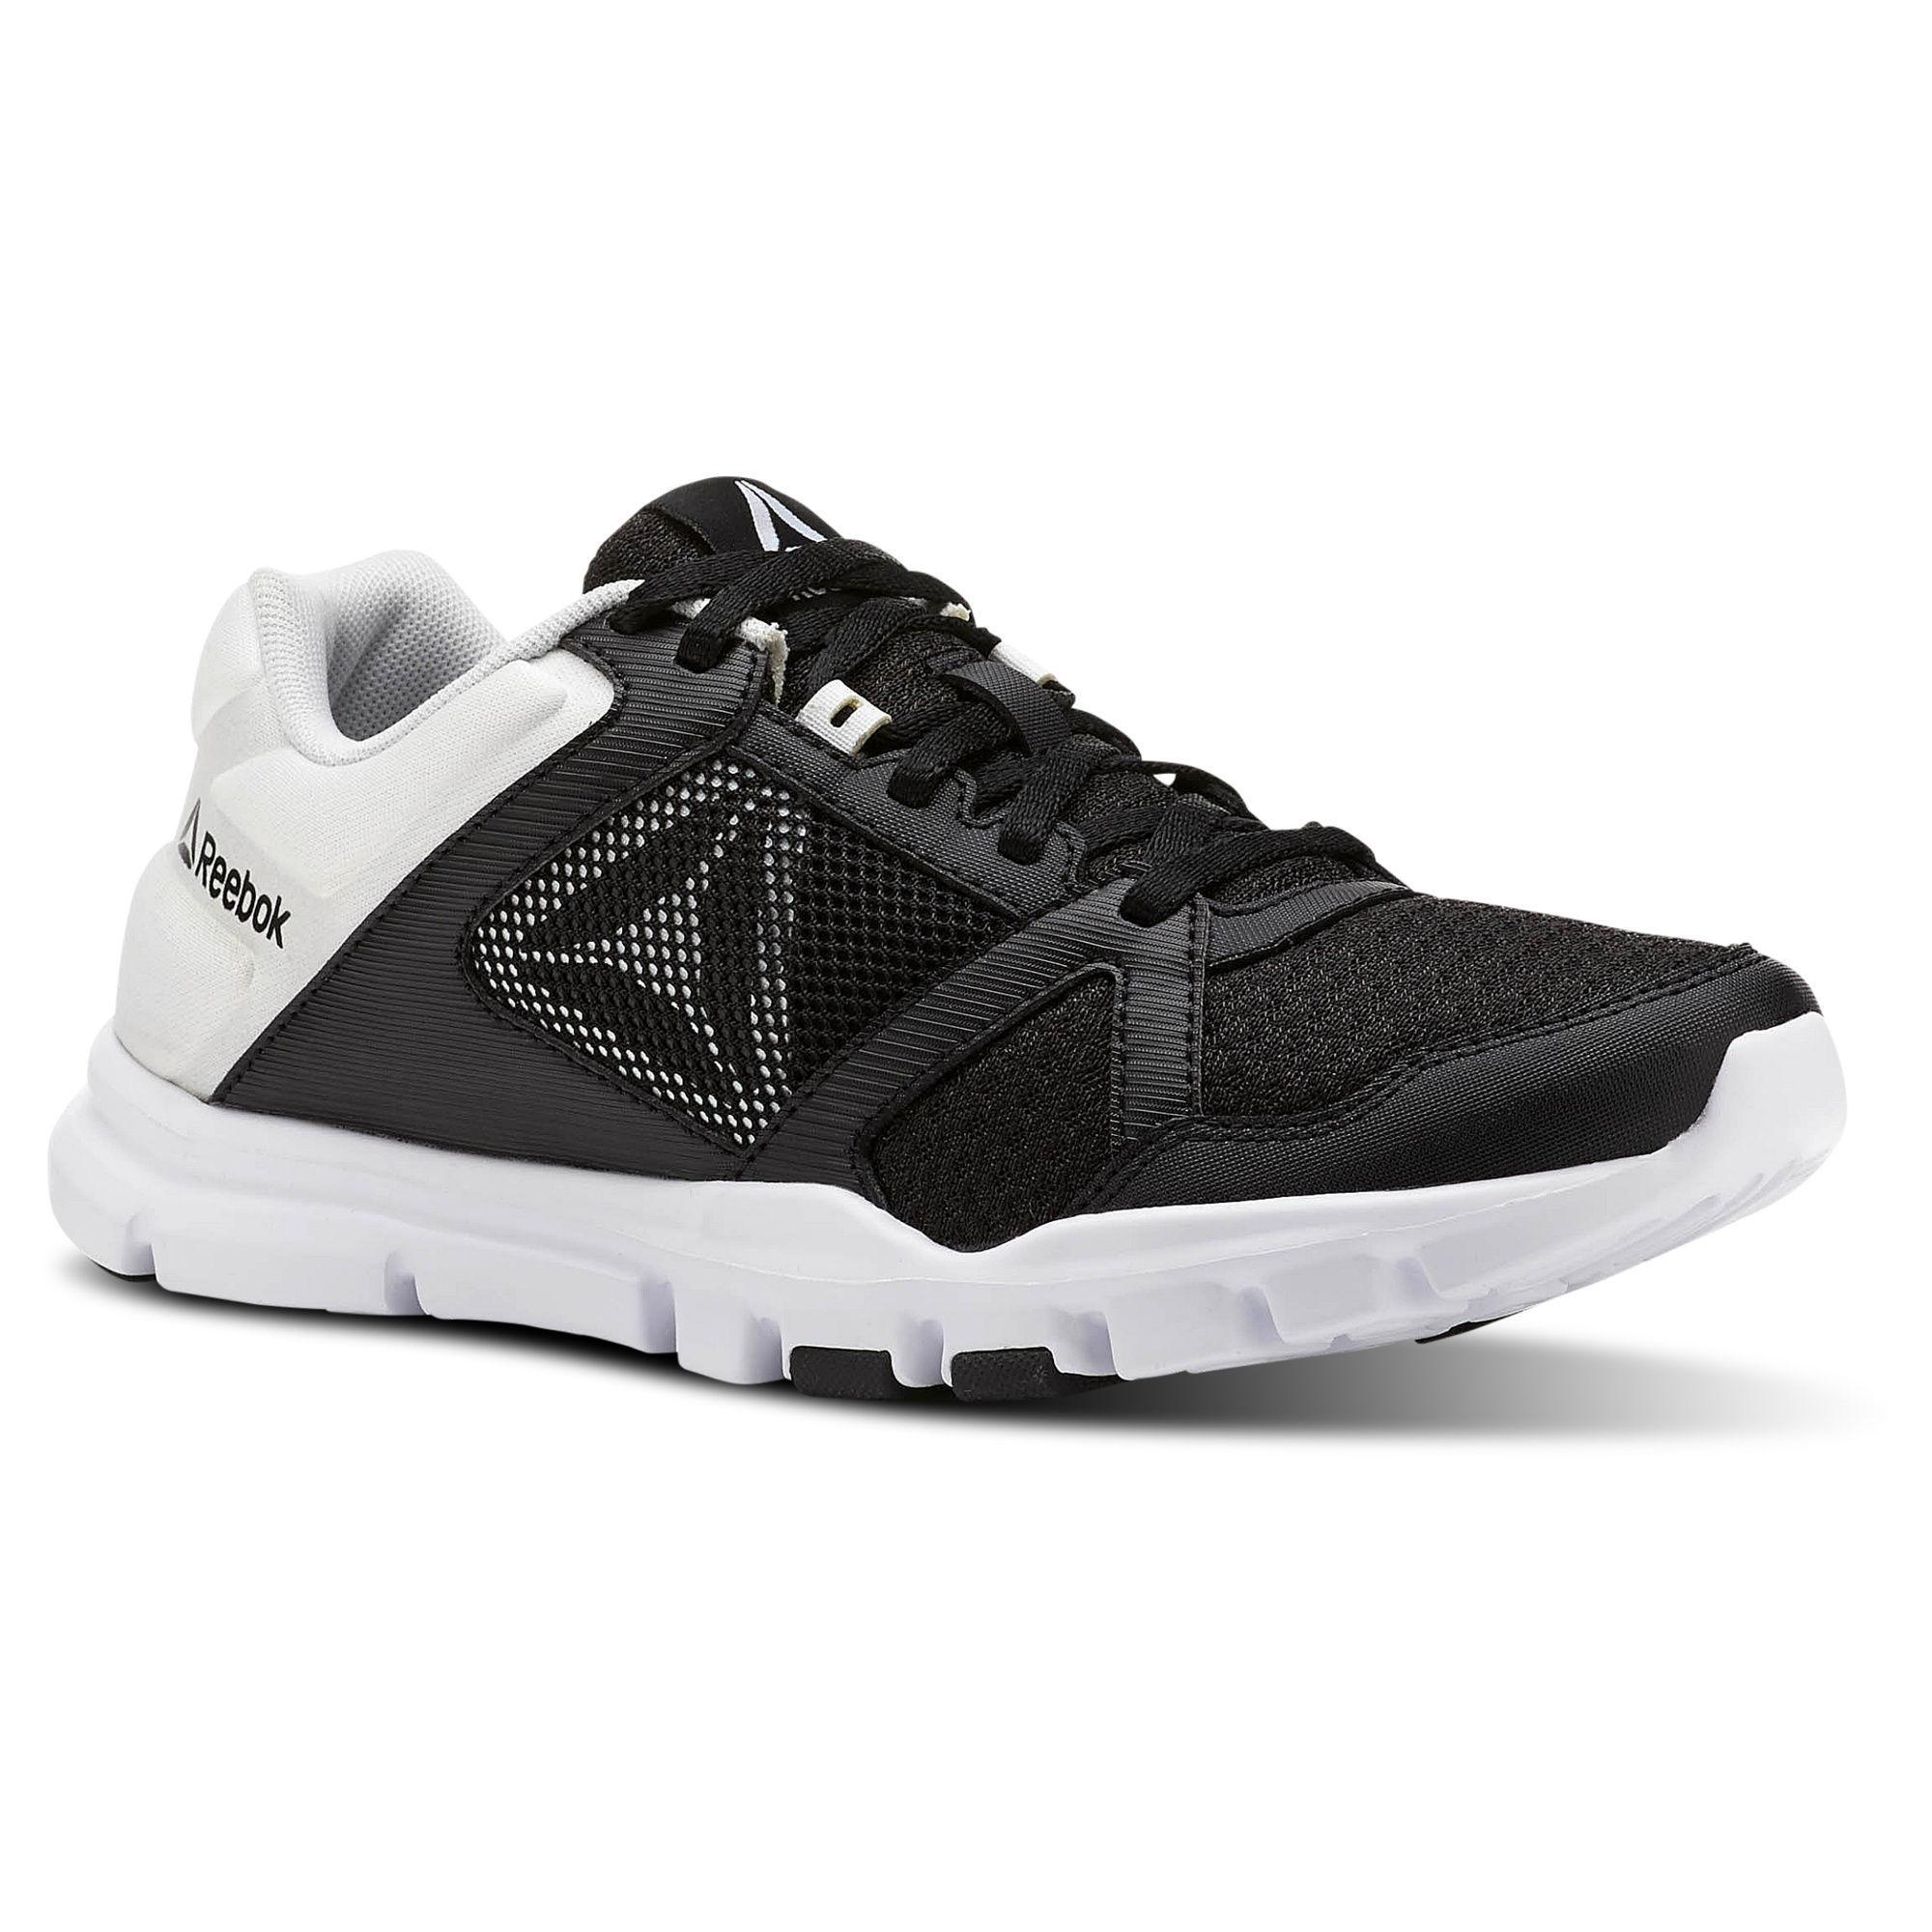 Reebok Yourflex Trainette 10 MT Sepatu Olahraga Wanita - Hitam 1b19c5b591